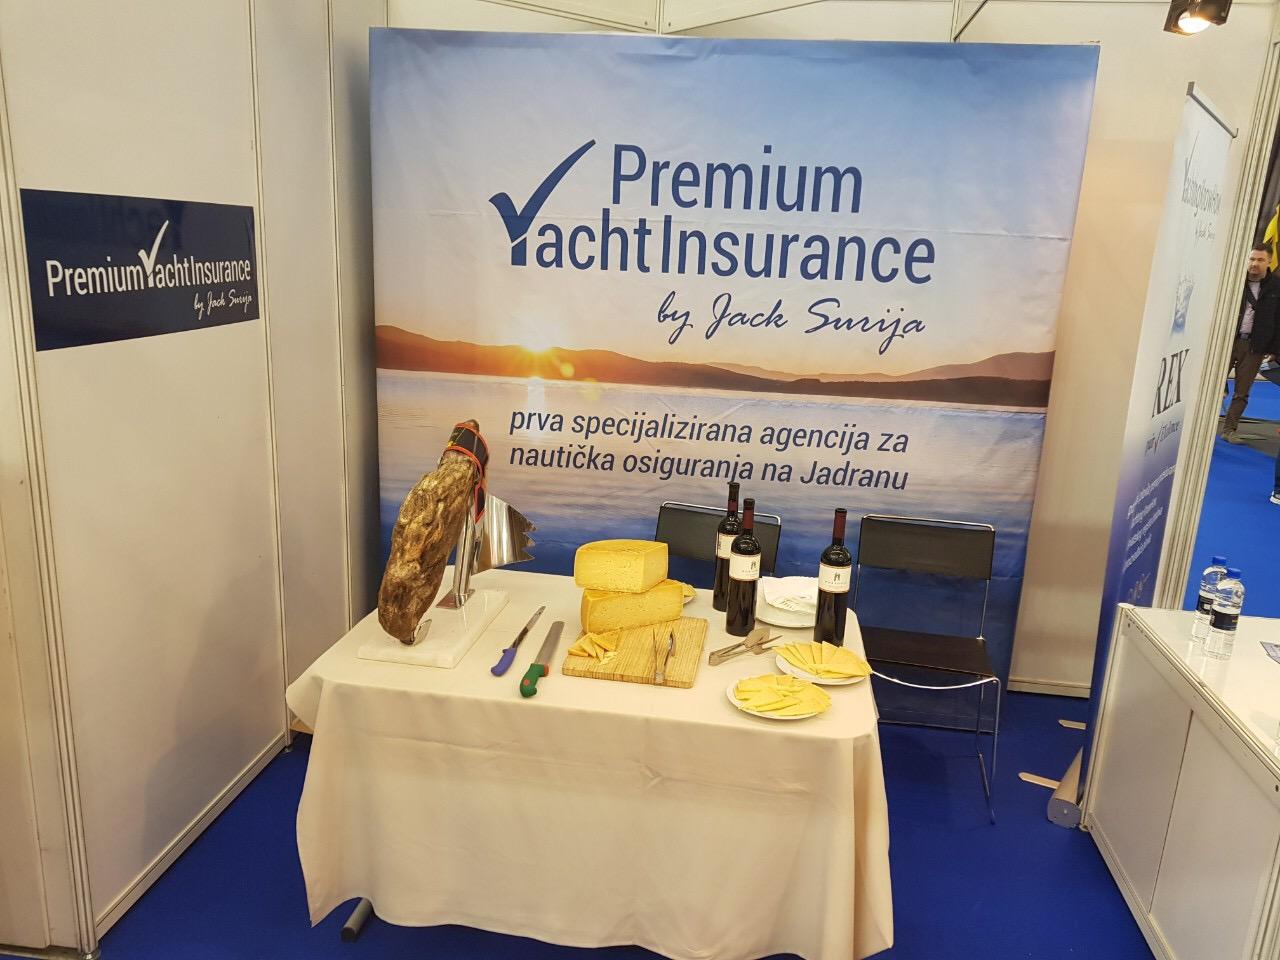 Premium Yacht Insurance REX award ceremony 2019